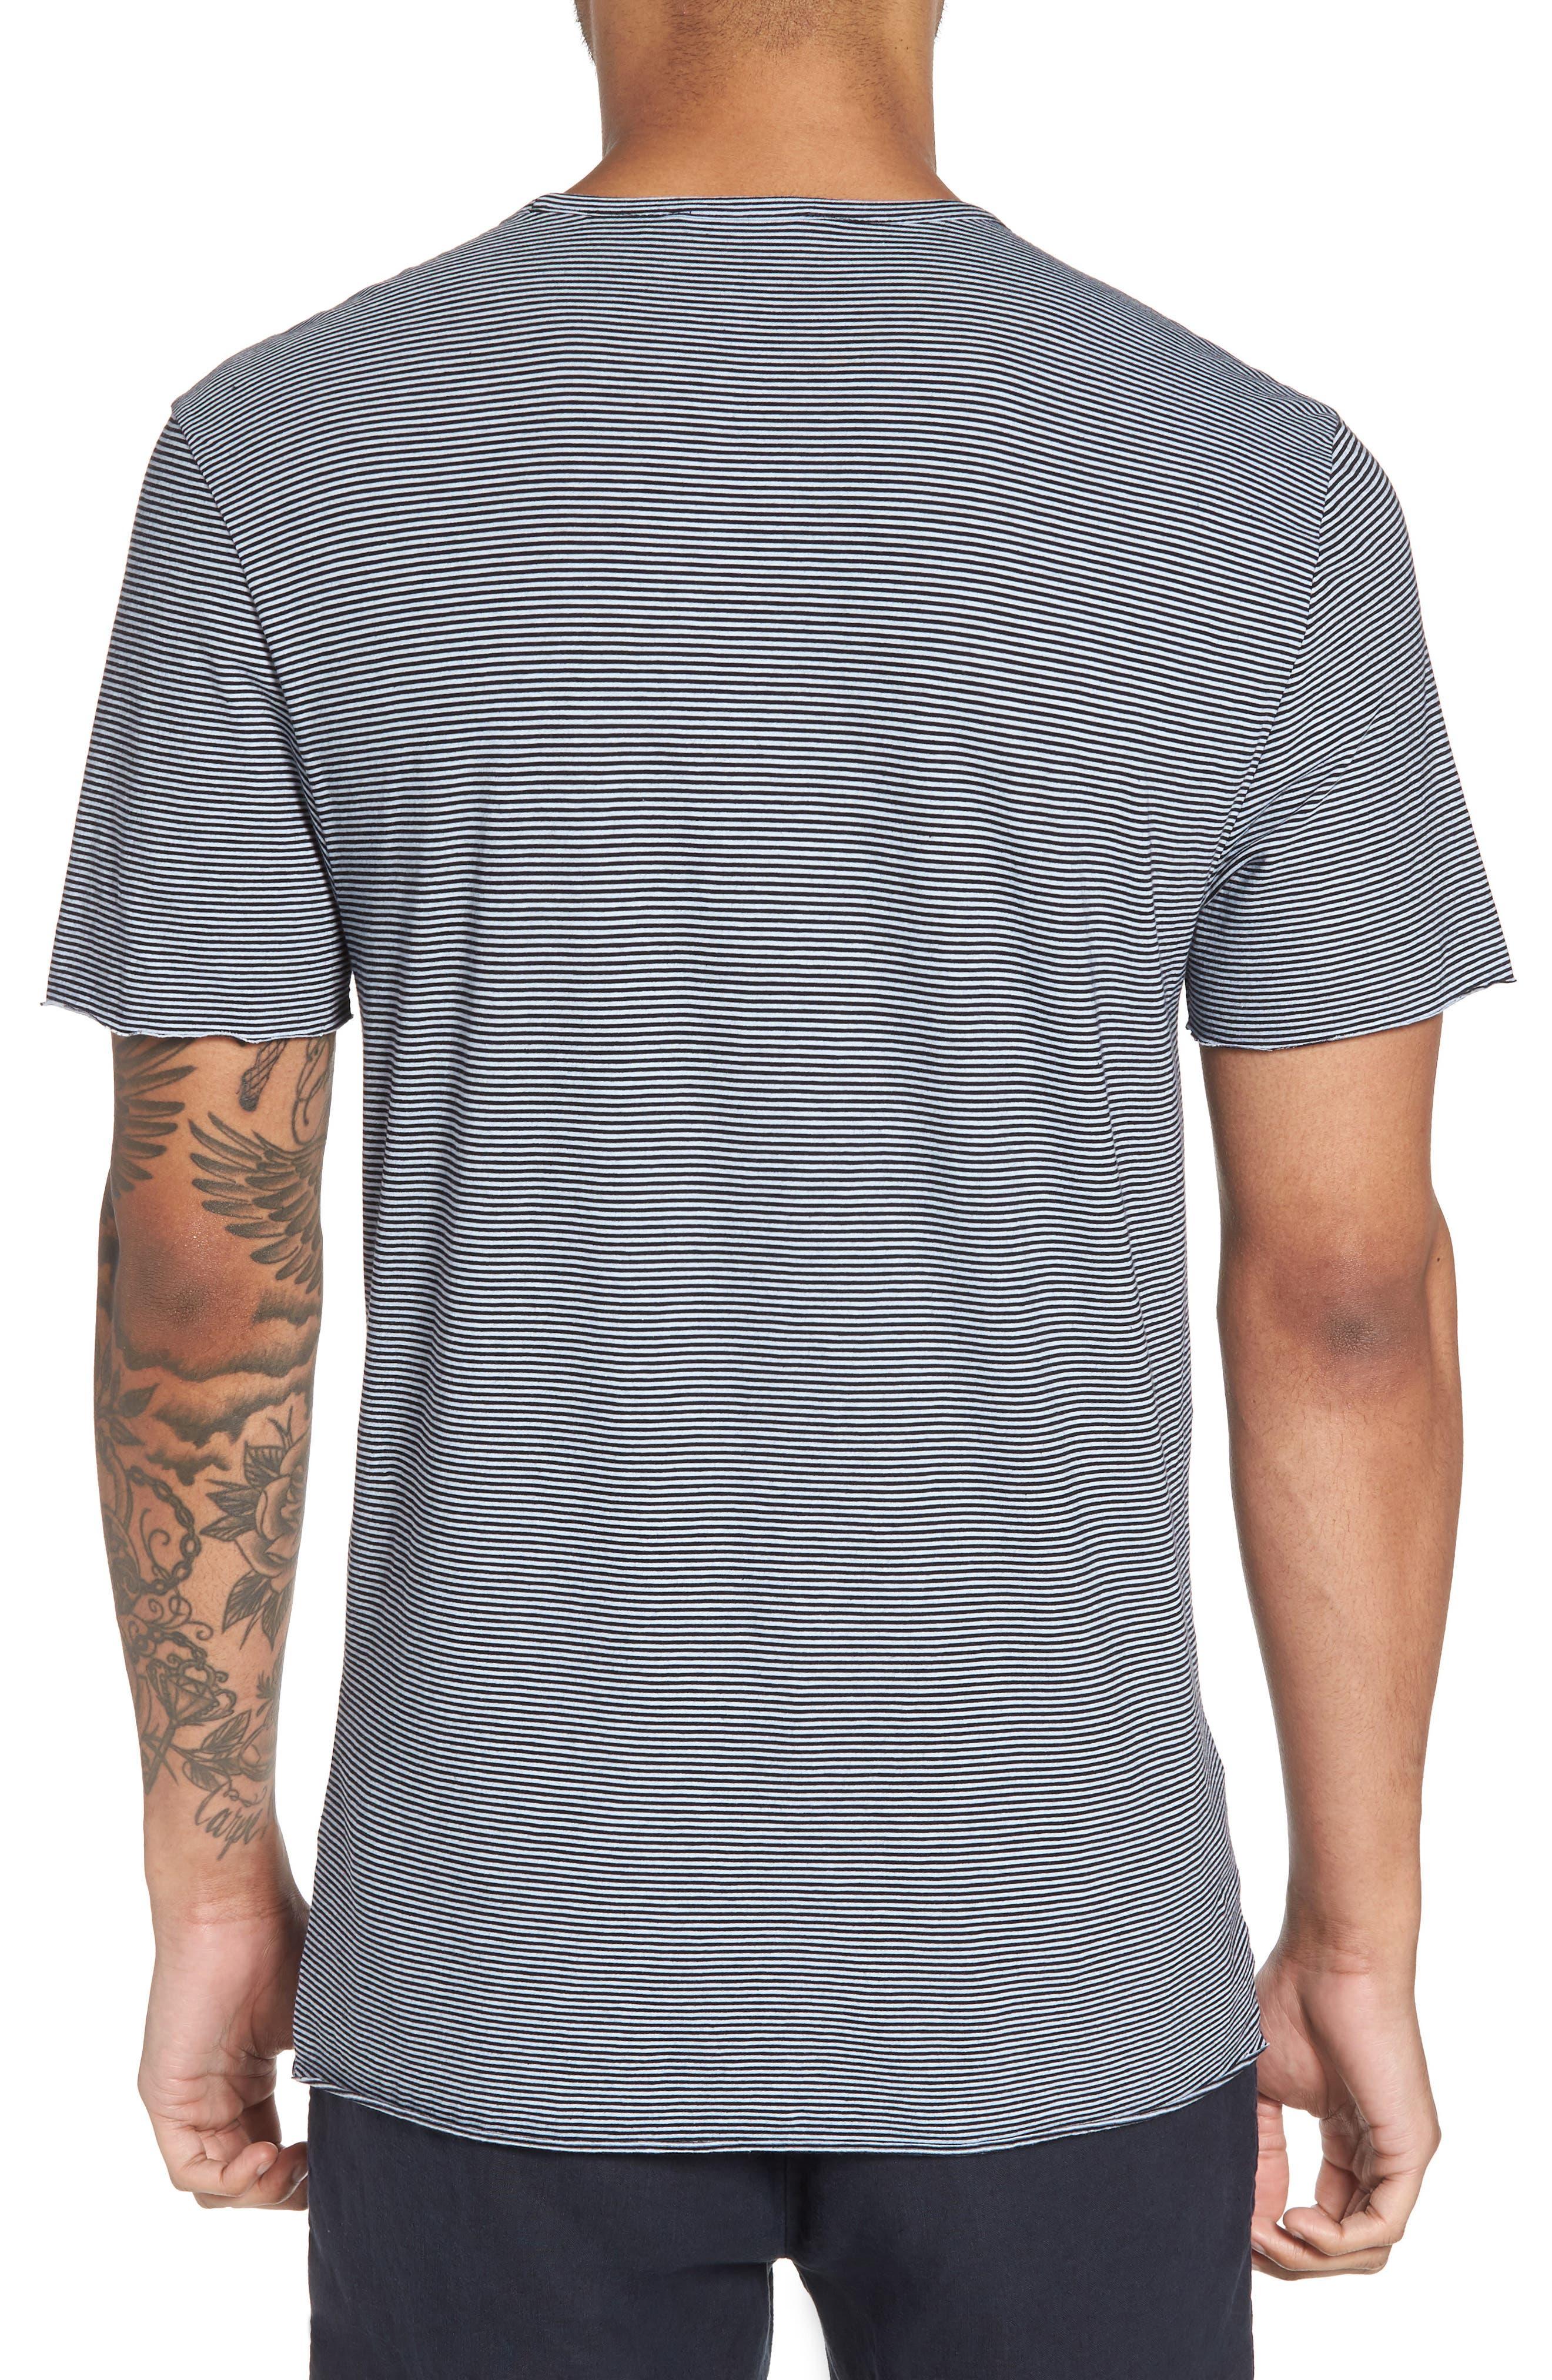 Slim Fit Stripe Pocket T-Shirt,                             Alternate thumbnail 2, color,                             New Coastal/ Feather